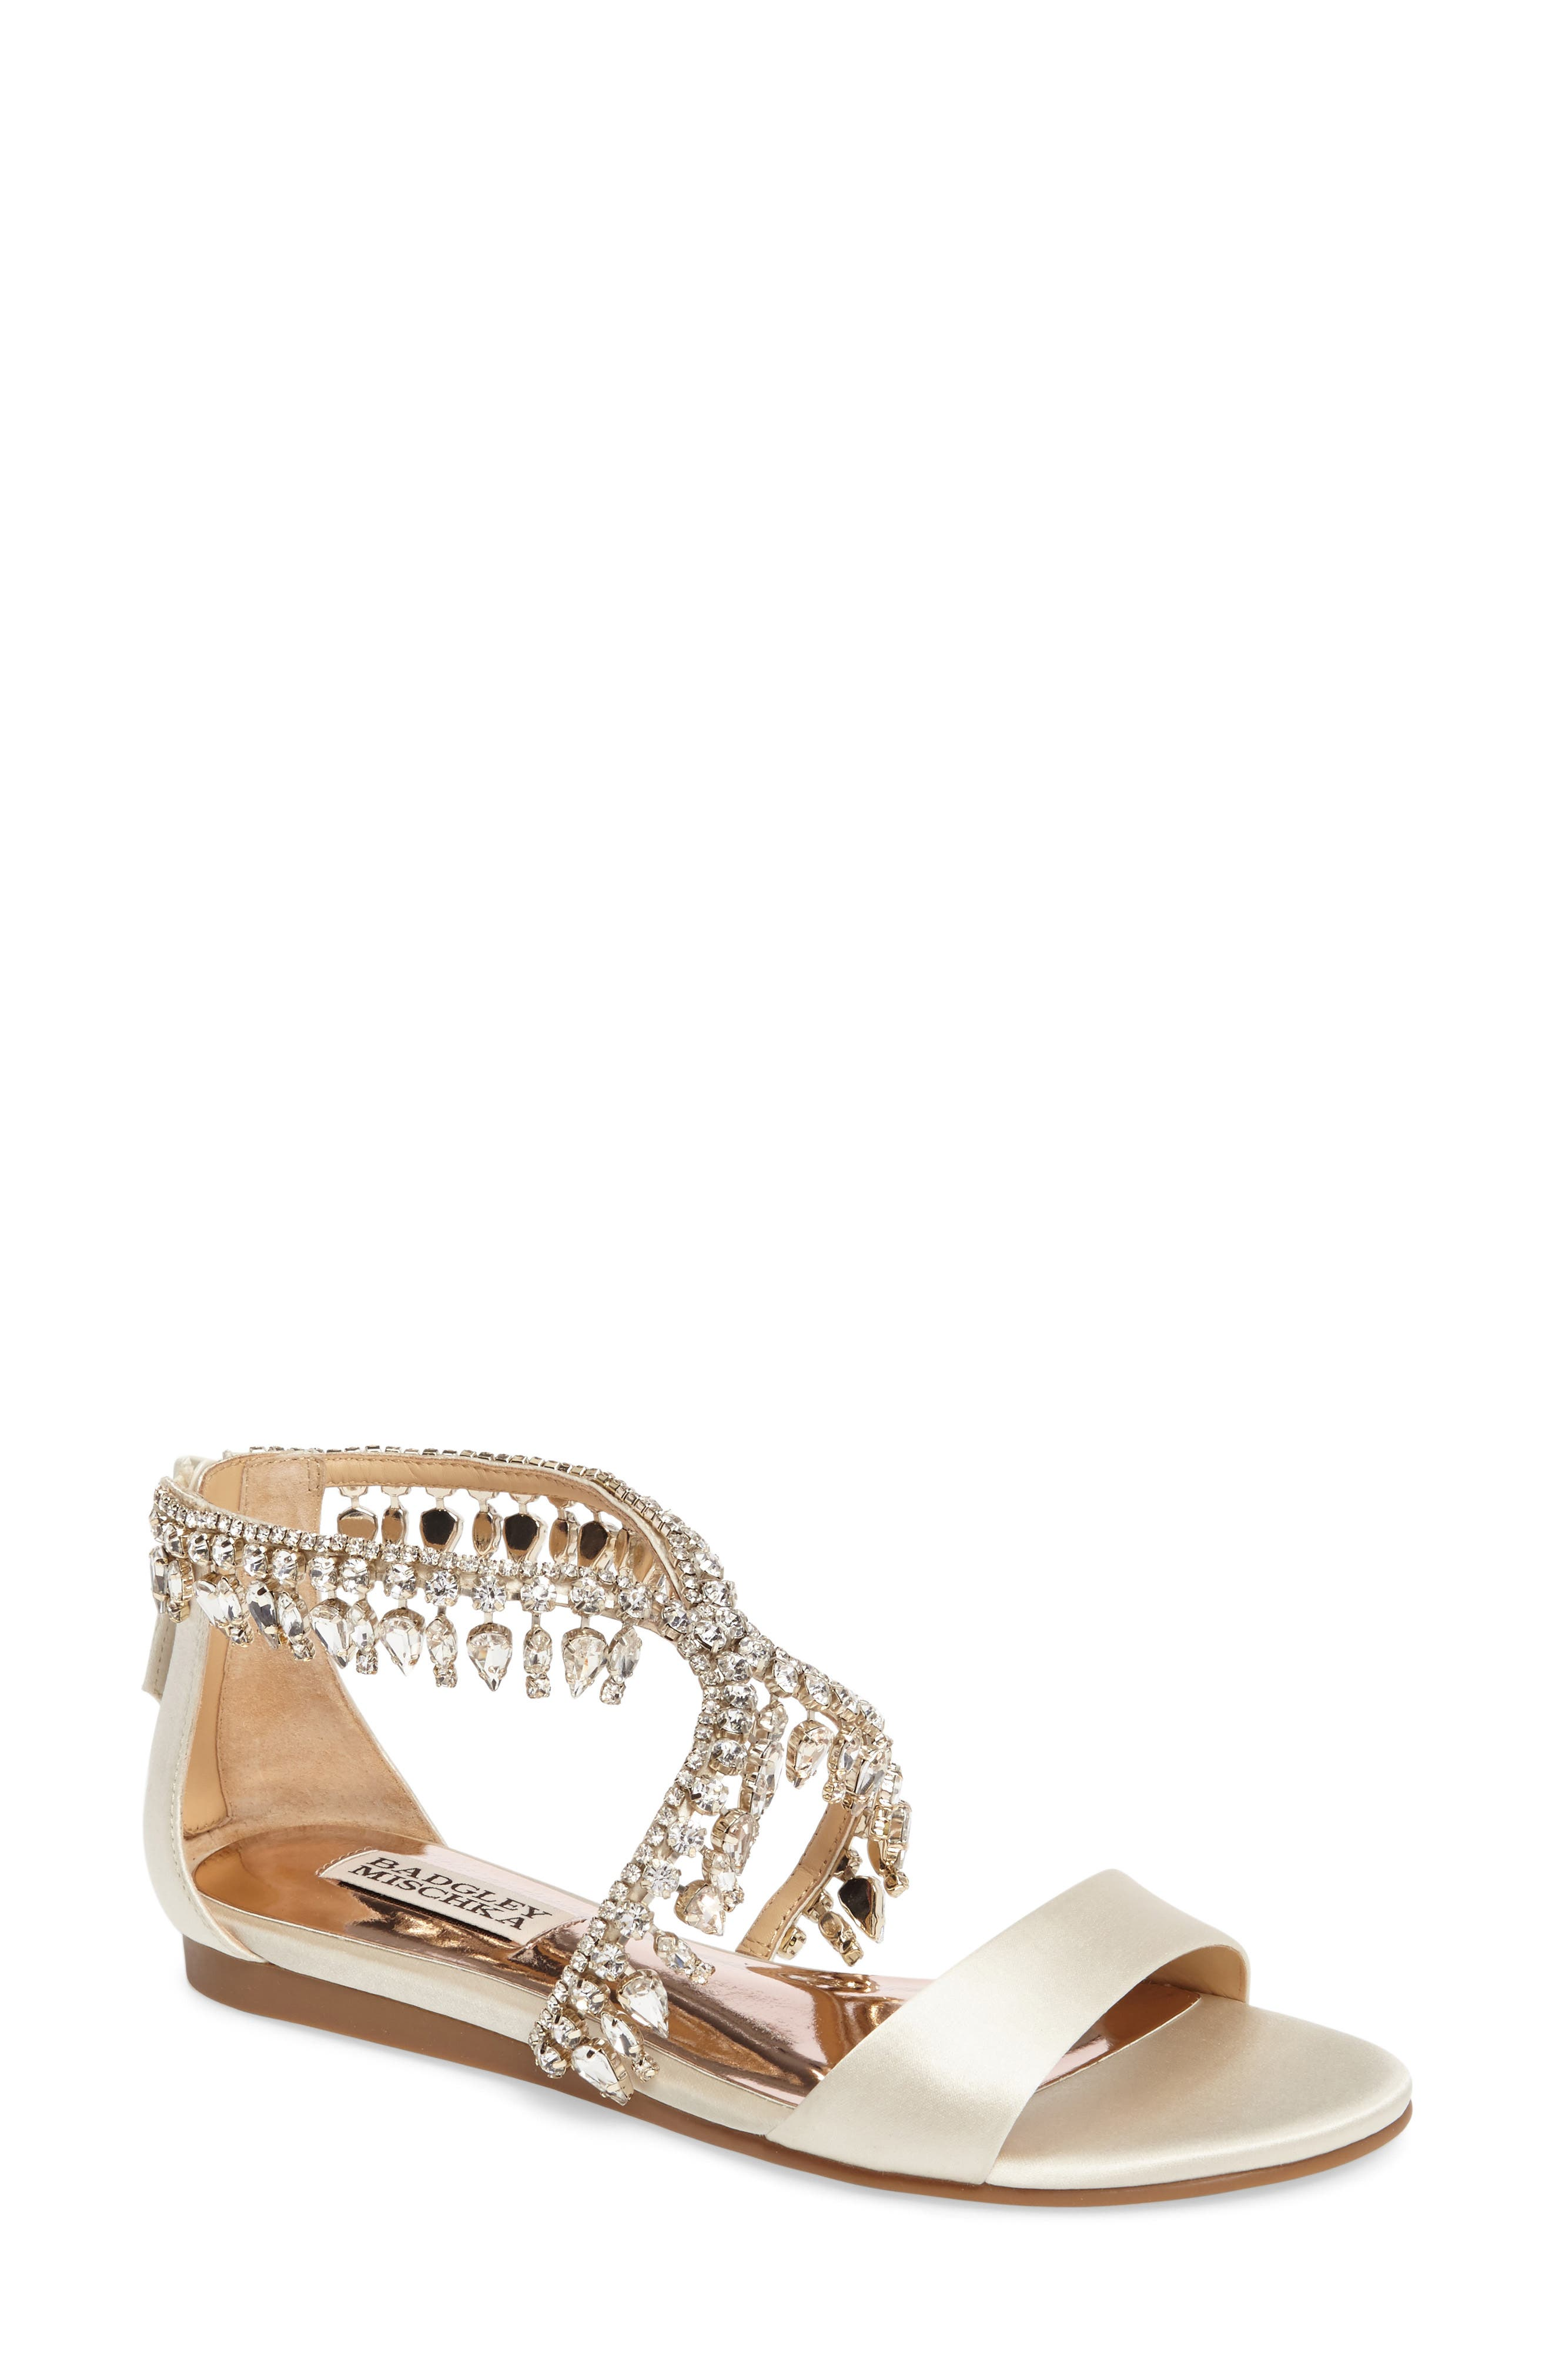 Main Image - Badgley Mischka Tristen Crystal Sandal (Women)